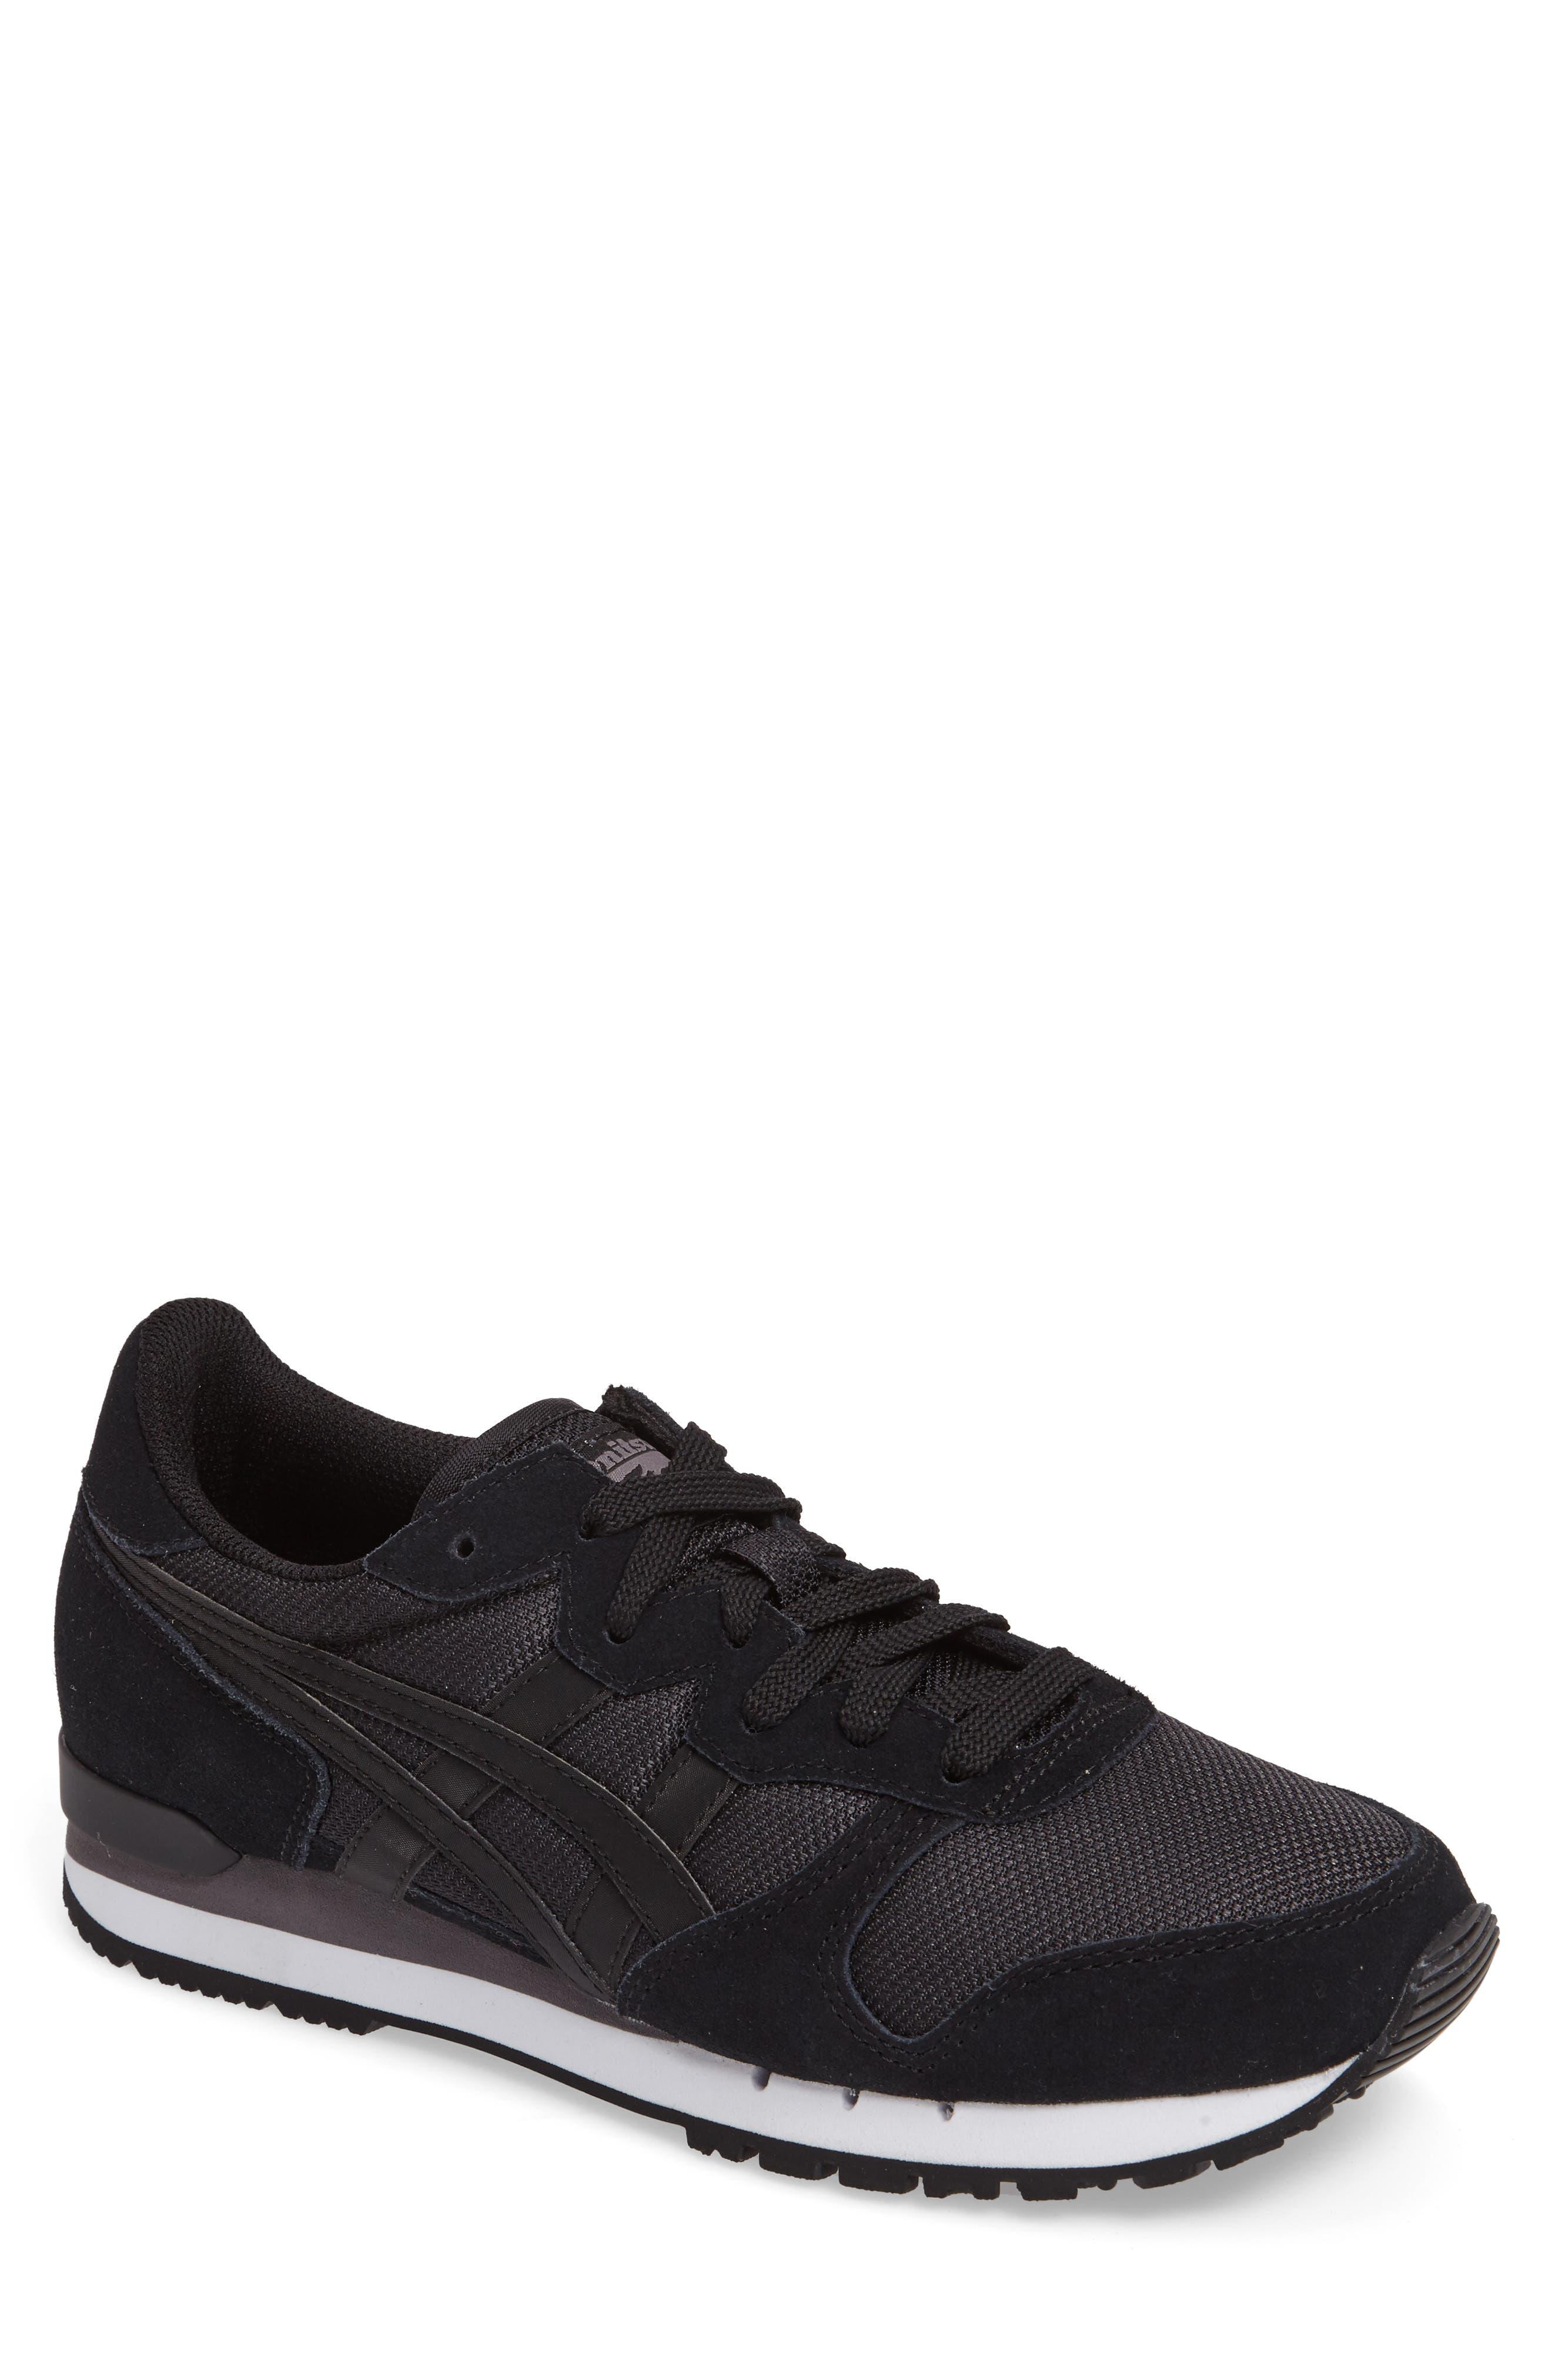 Main Image - Onitsuka Tiger™ Alvarado Sneaker (Men)